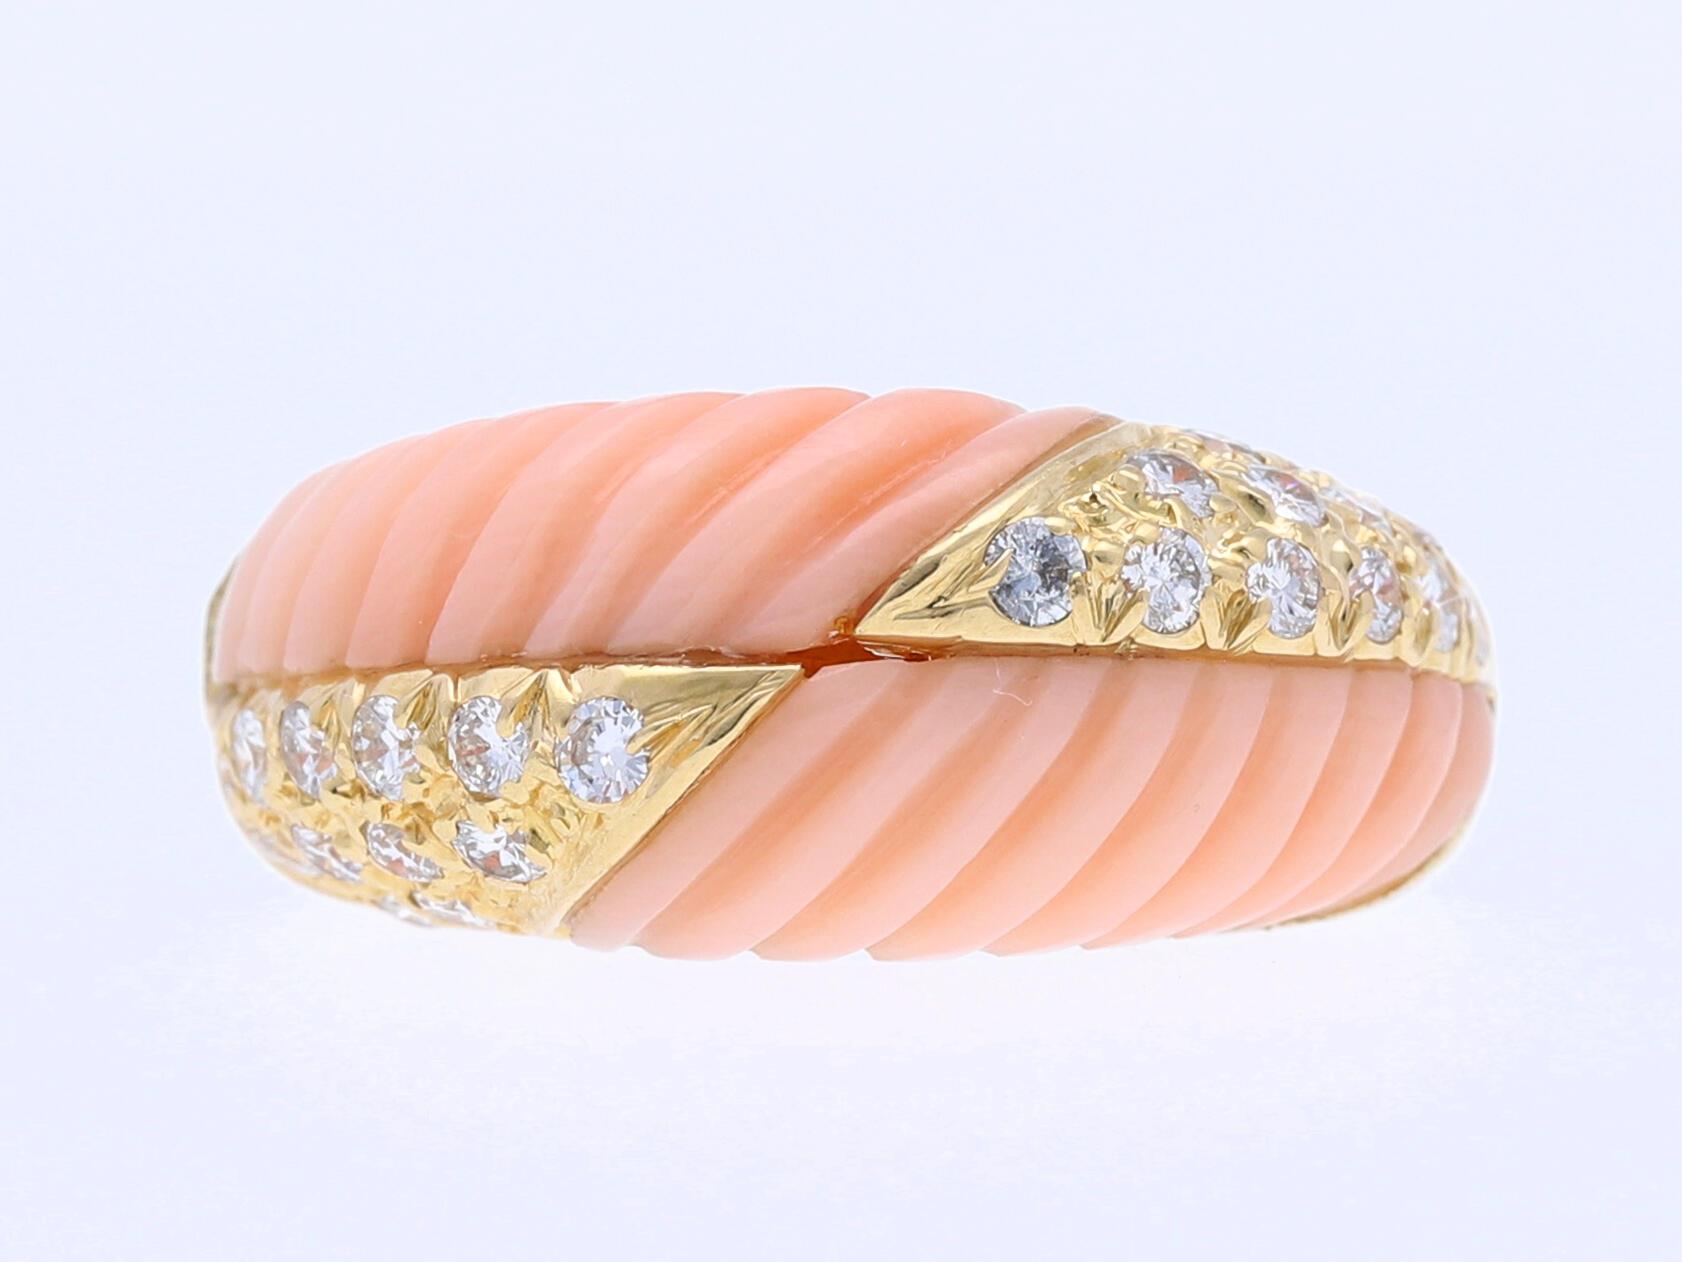 wert eur ring brillanten engelshaut koralle 750 gold um 1990 ebay. Black Bedroom Furniture Sets. Home Design Ideas